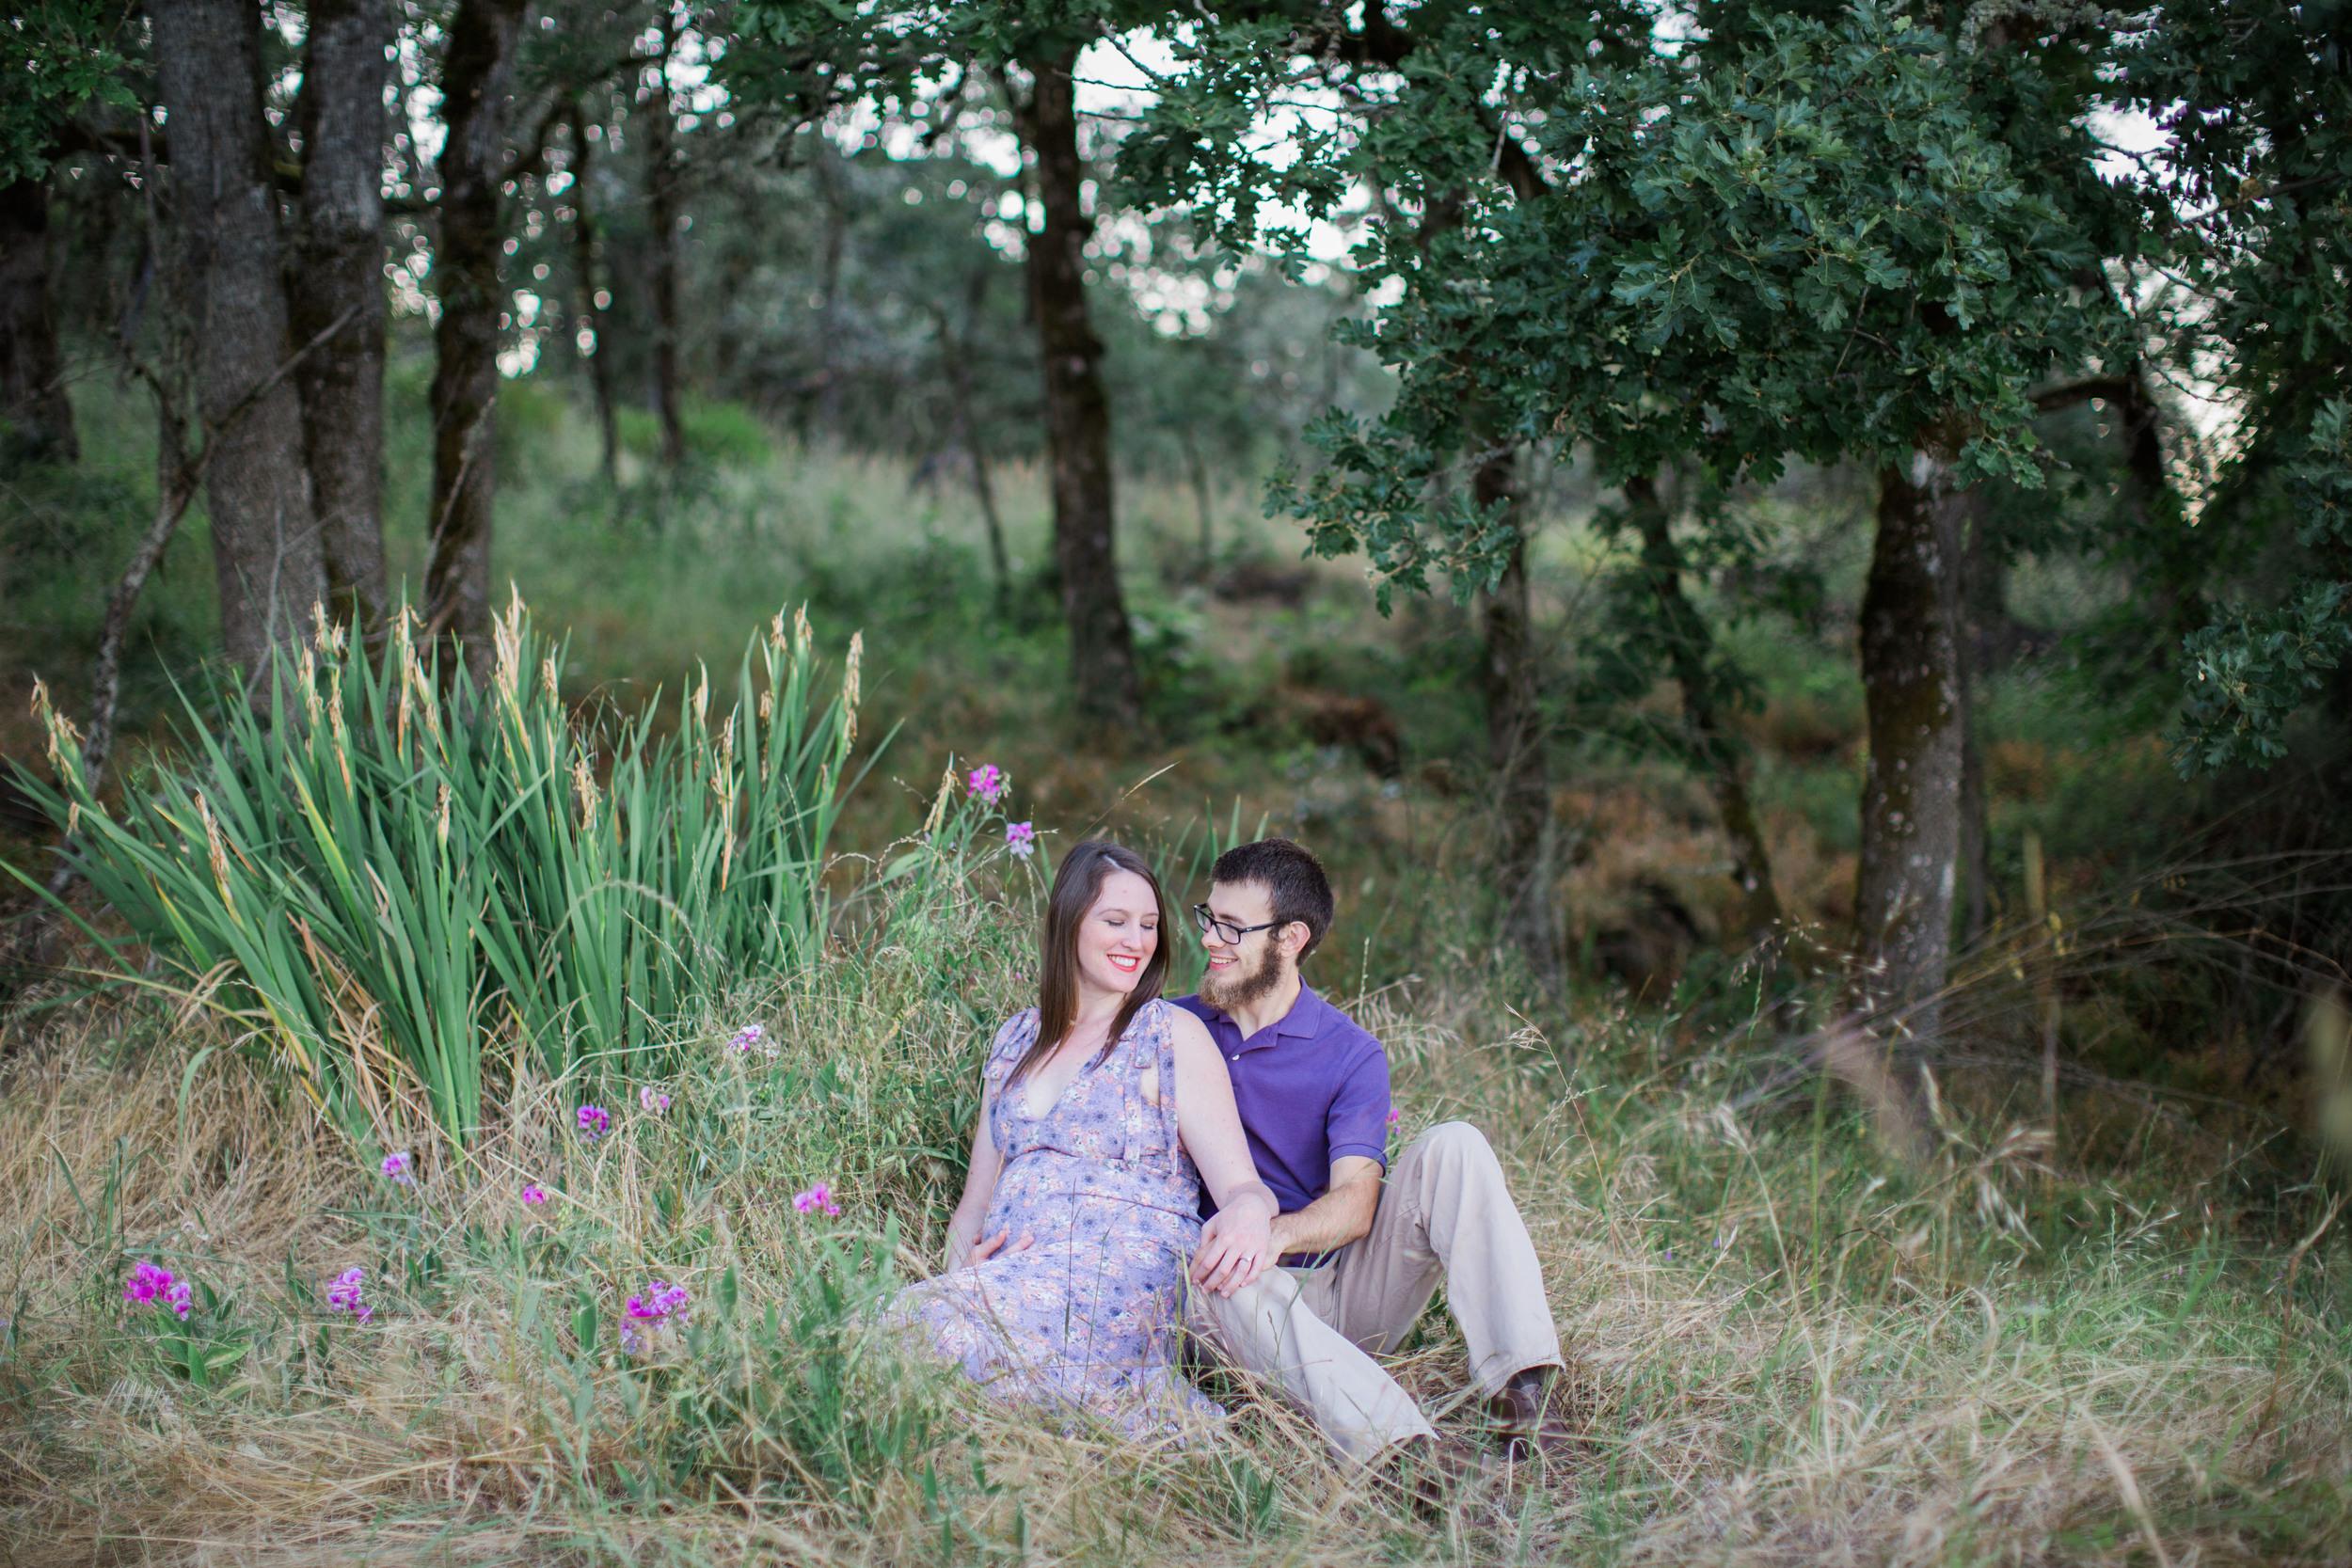 BrookeShane_maternity-11.jpg